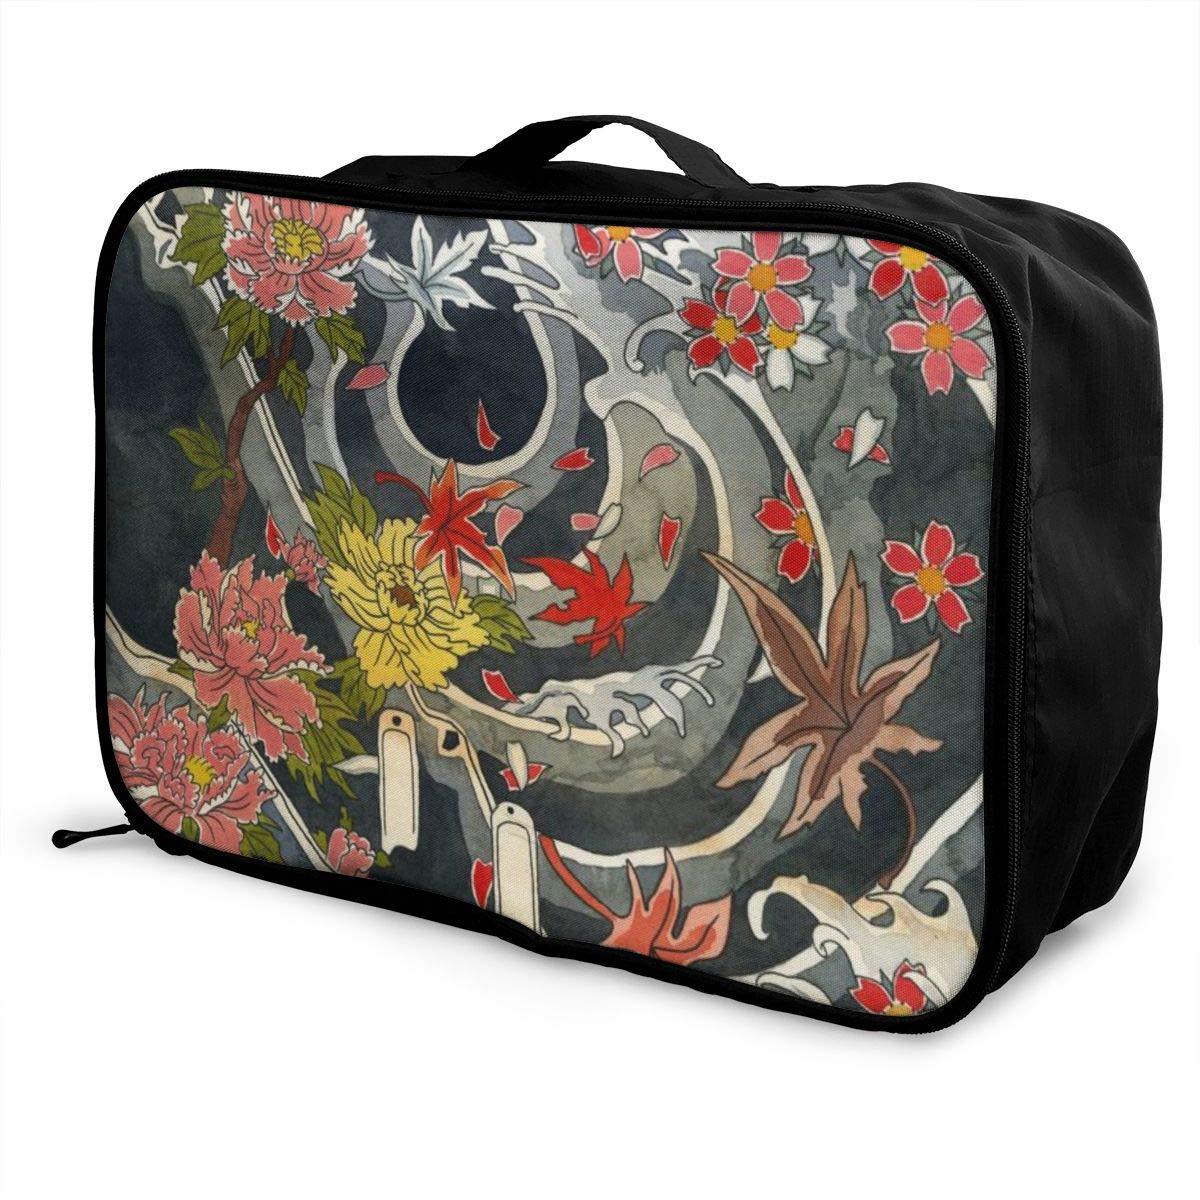 Japanese Floral Flowers Tattoo Chrysanthemum Travel Lightweight Waterproof Folding Storage Portable Luggage Duffle Tote Bag Large Capacity In Trolley Handle Bags 6x11x15 Inch